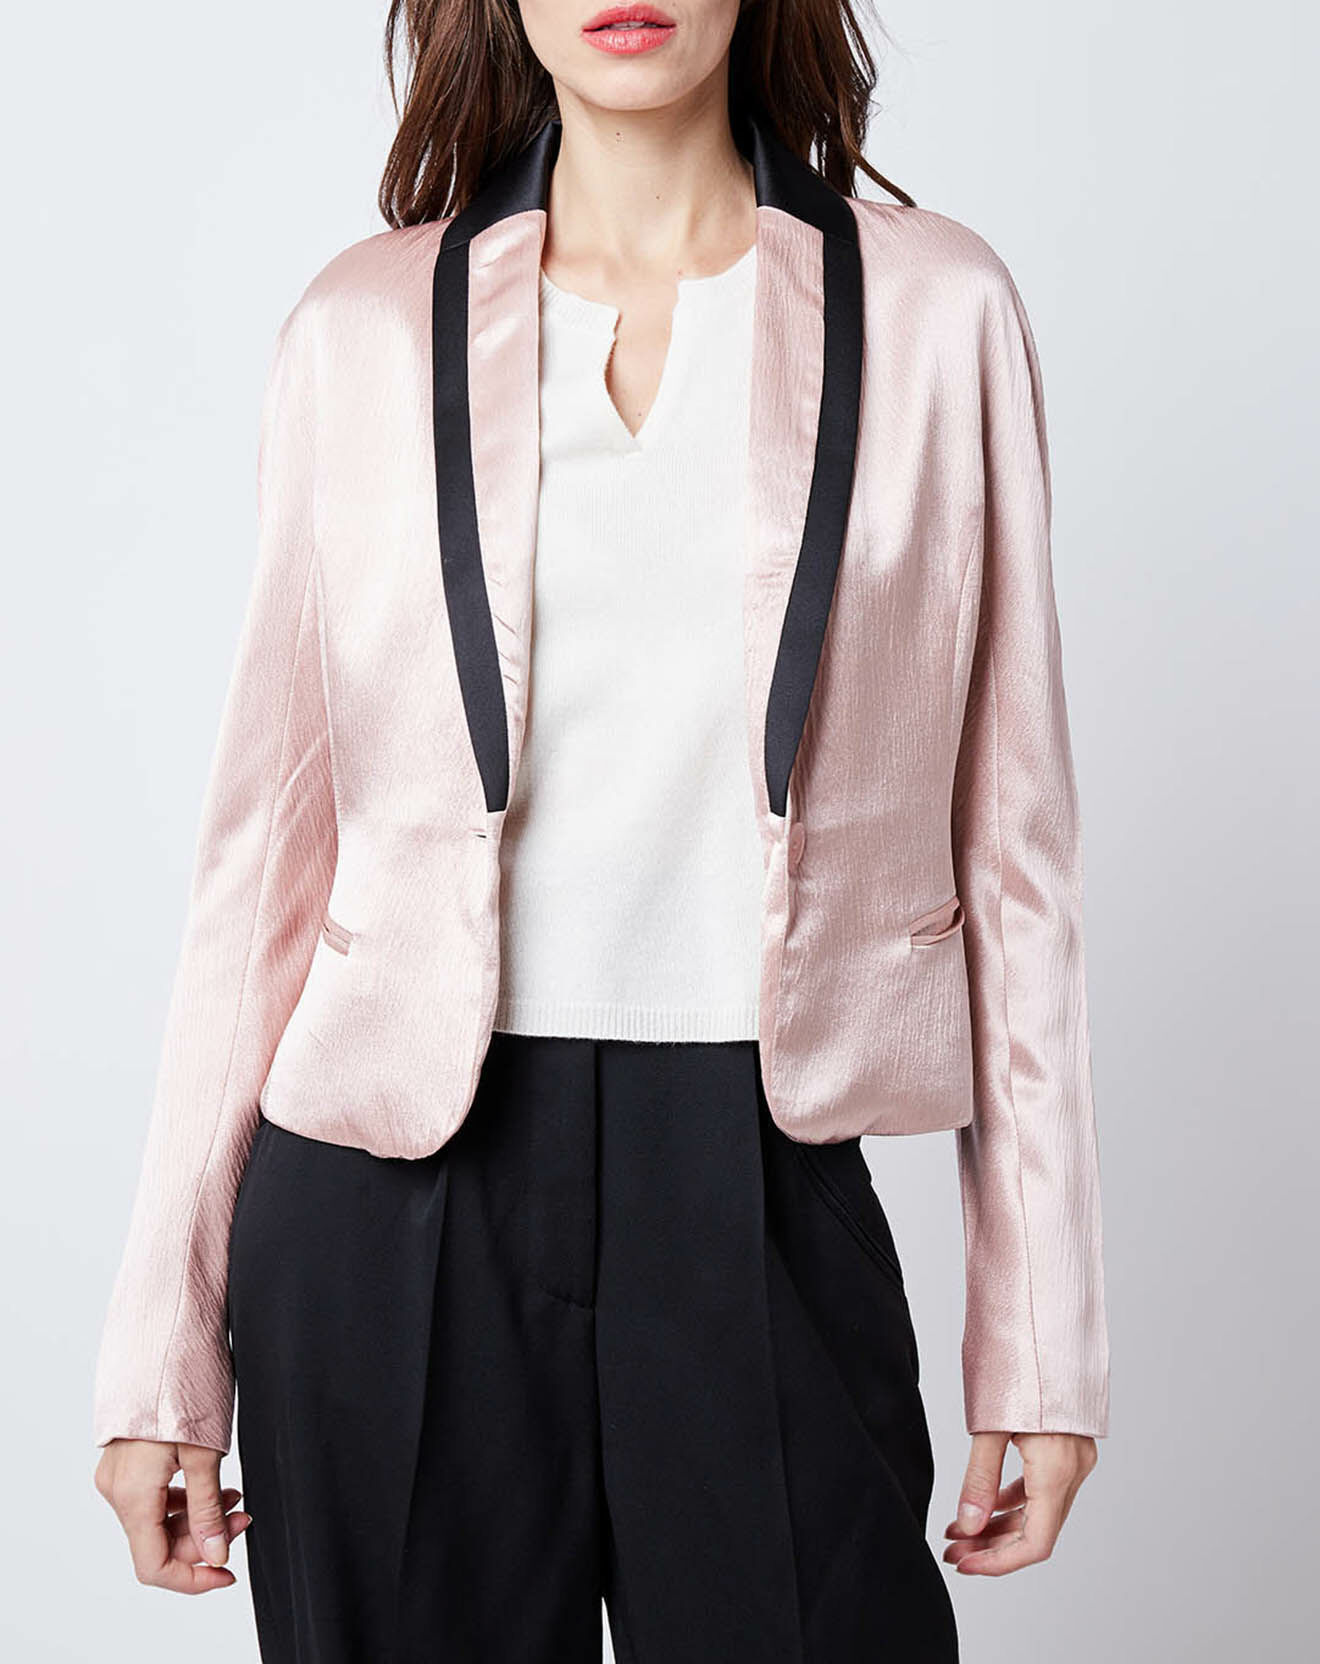 Veste courte satinée encolure contrastante rose/noir - John Galliano - Modalova